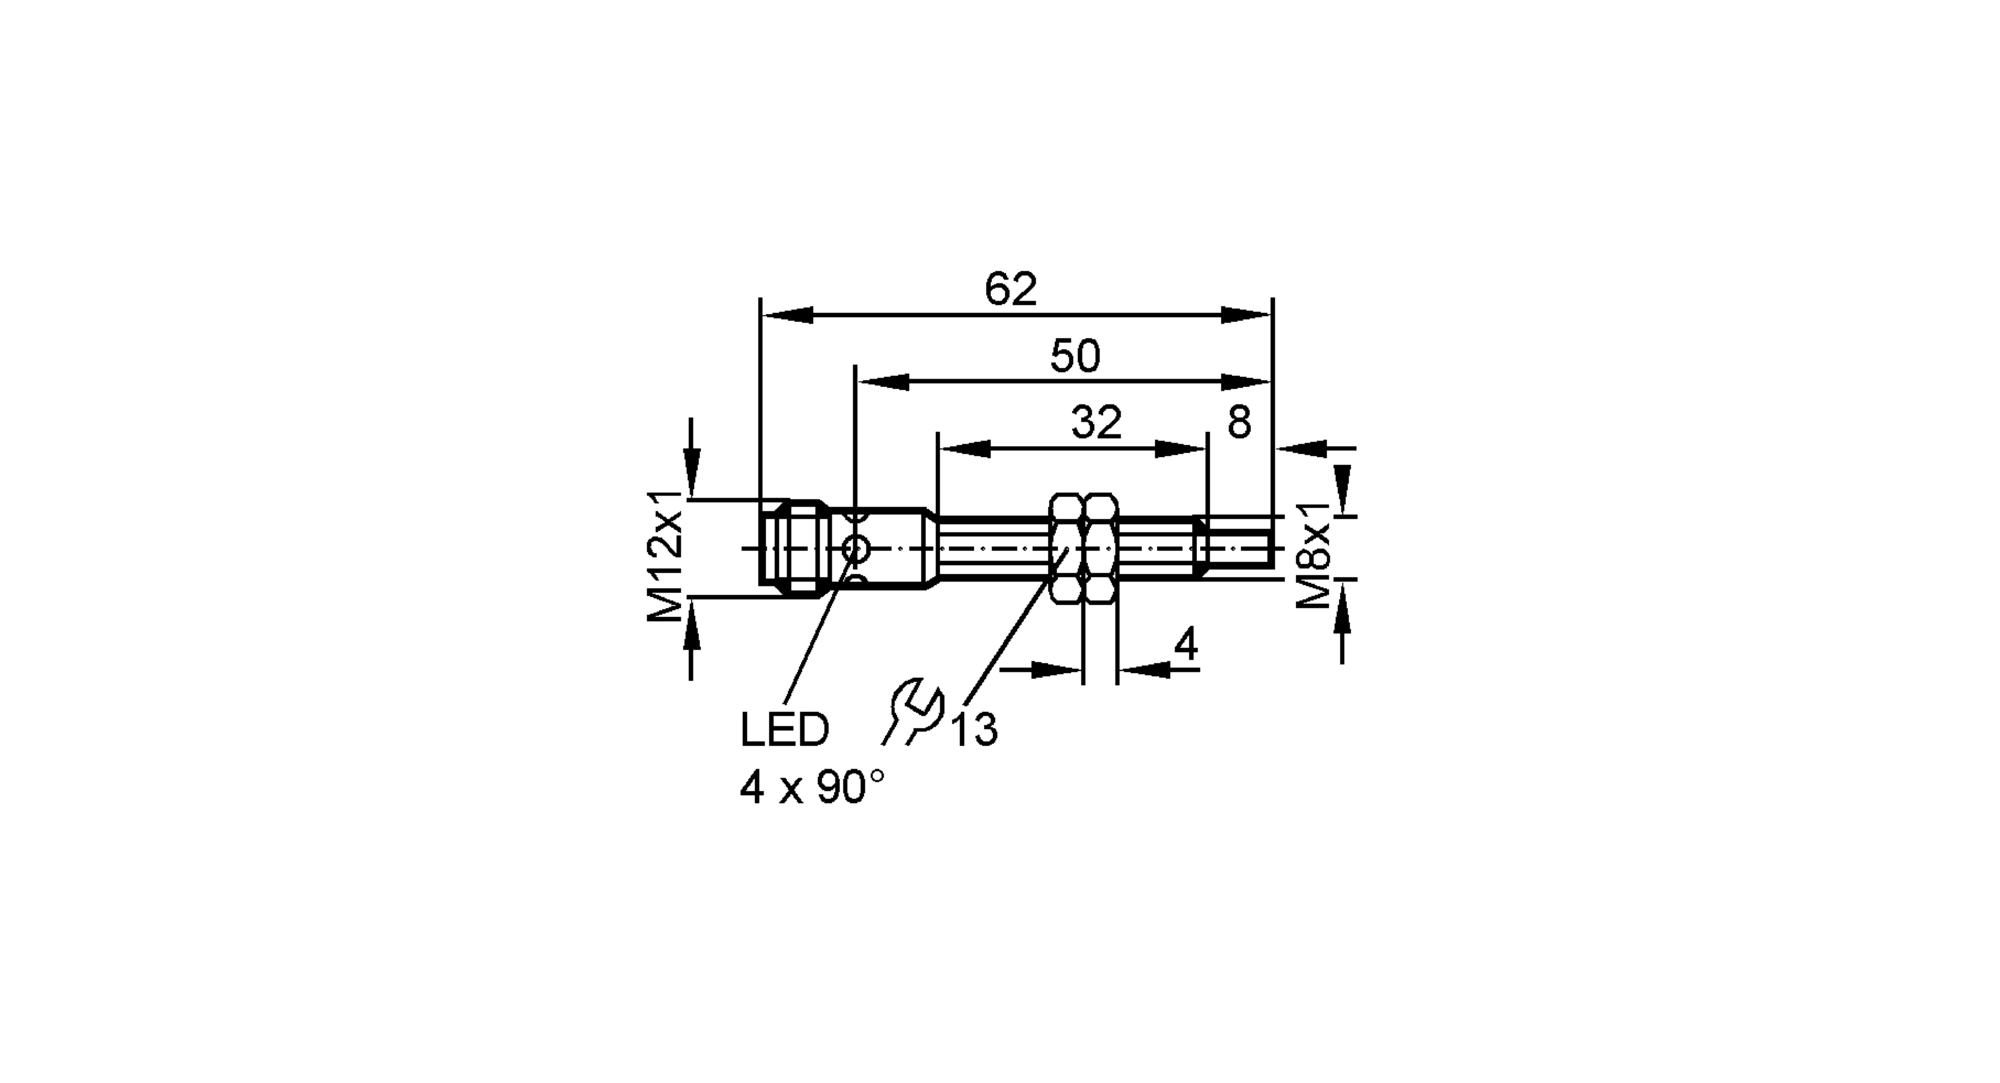 ie5331 - inductive sensor